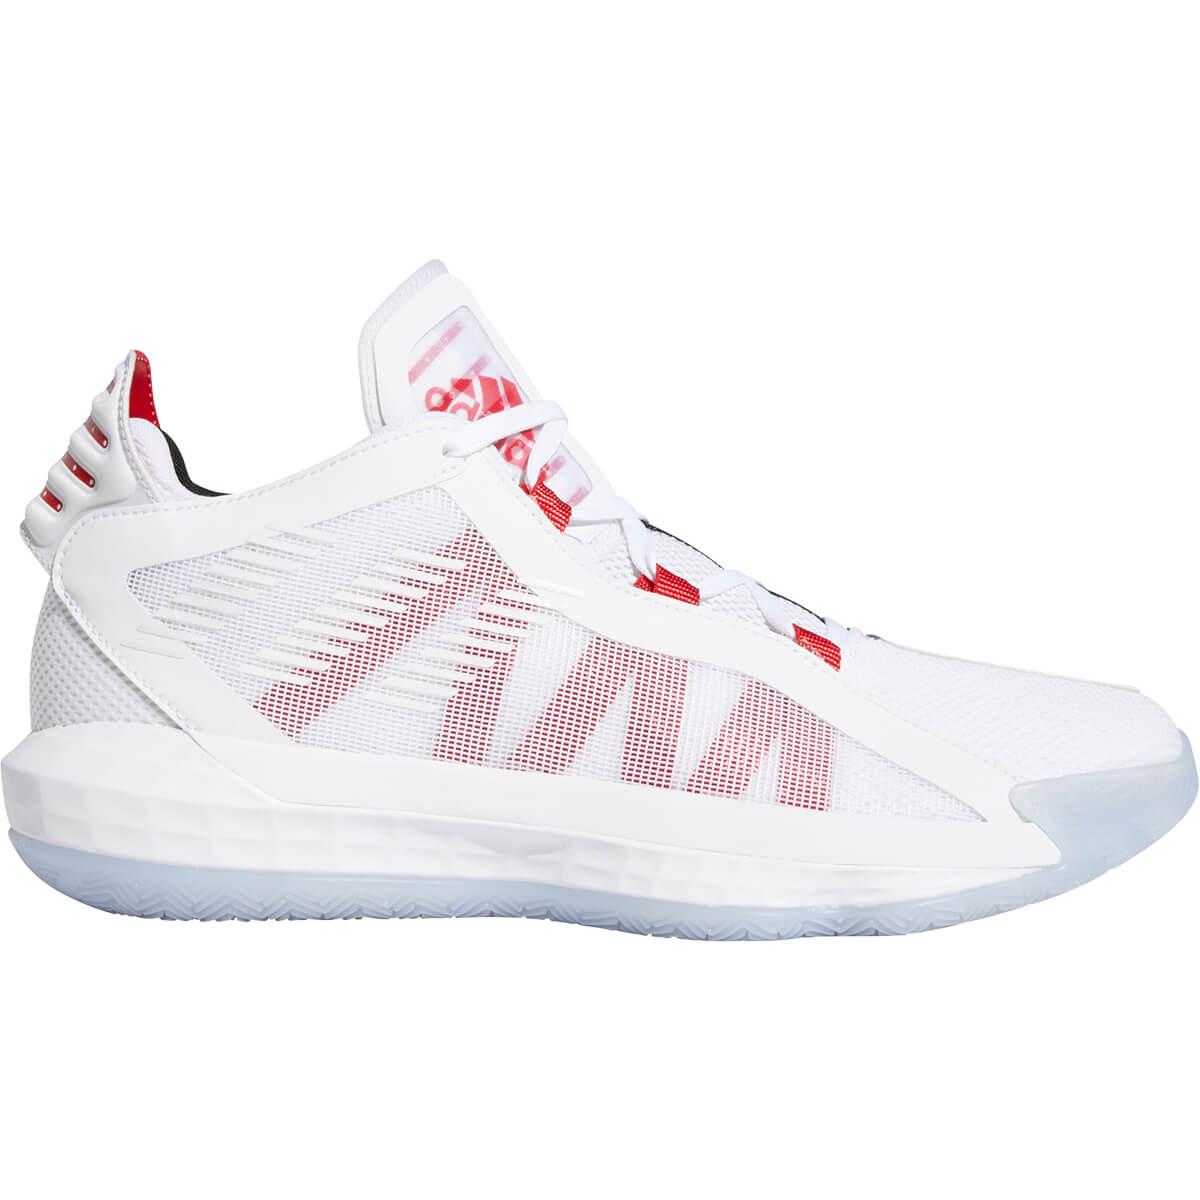 adidas Dame 6 Basketboldsko Herre